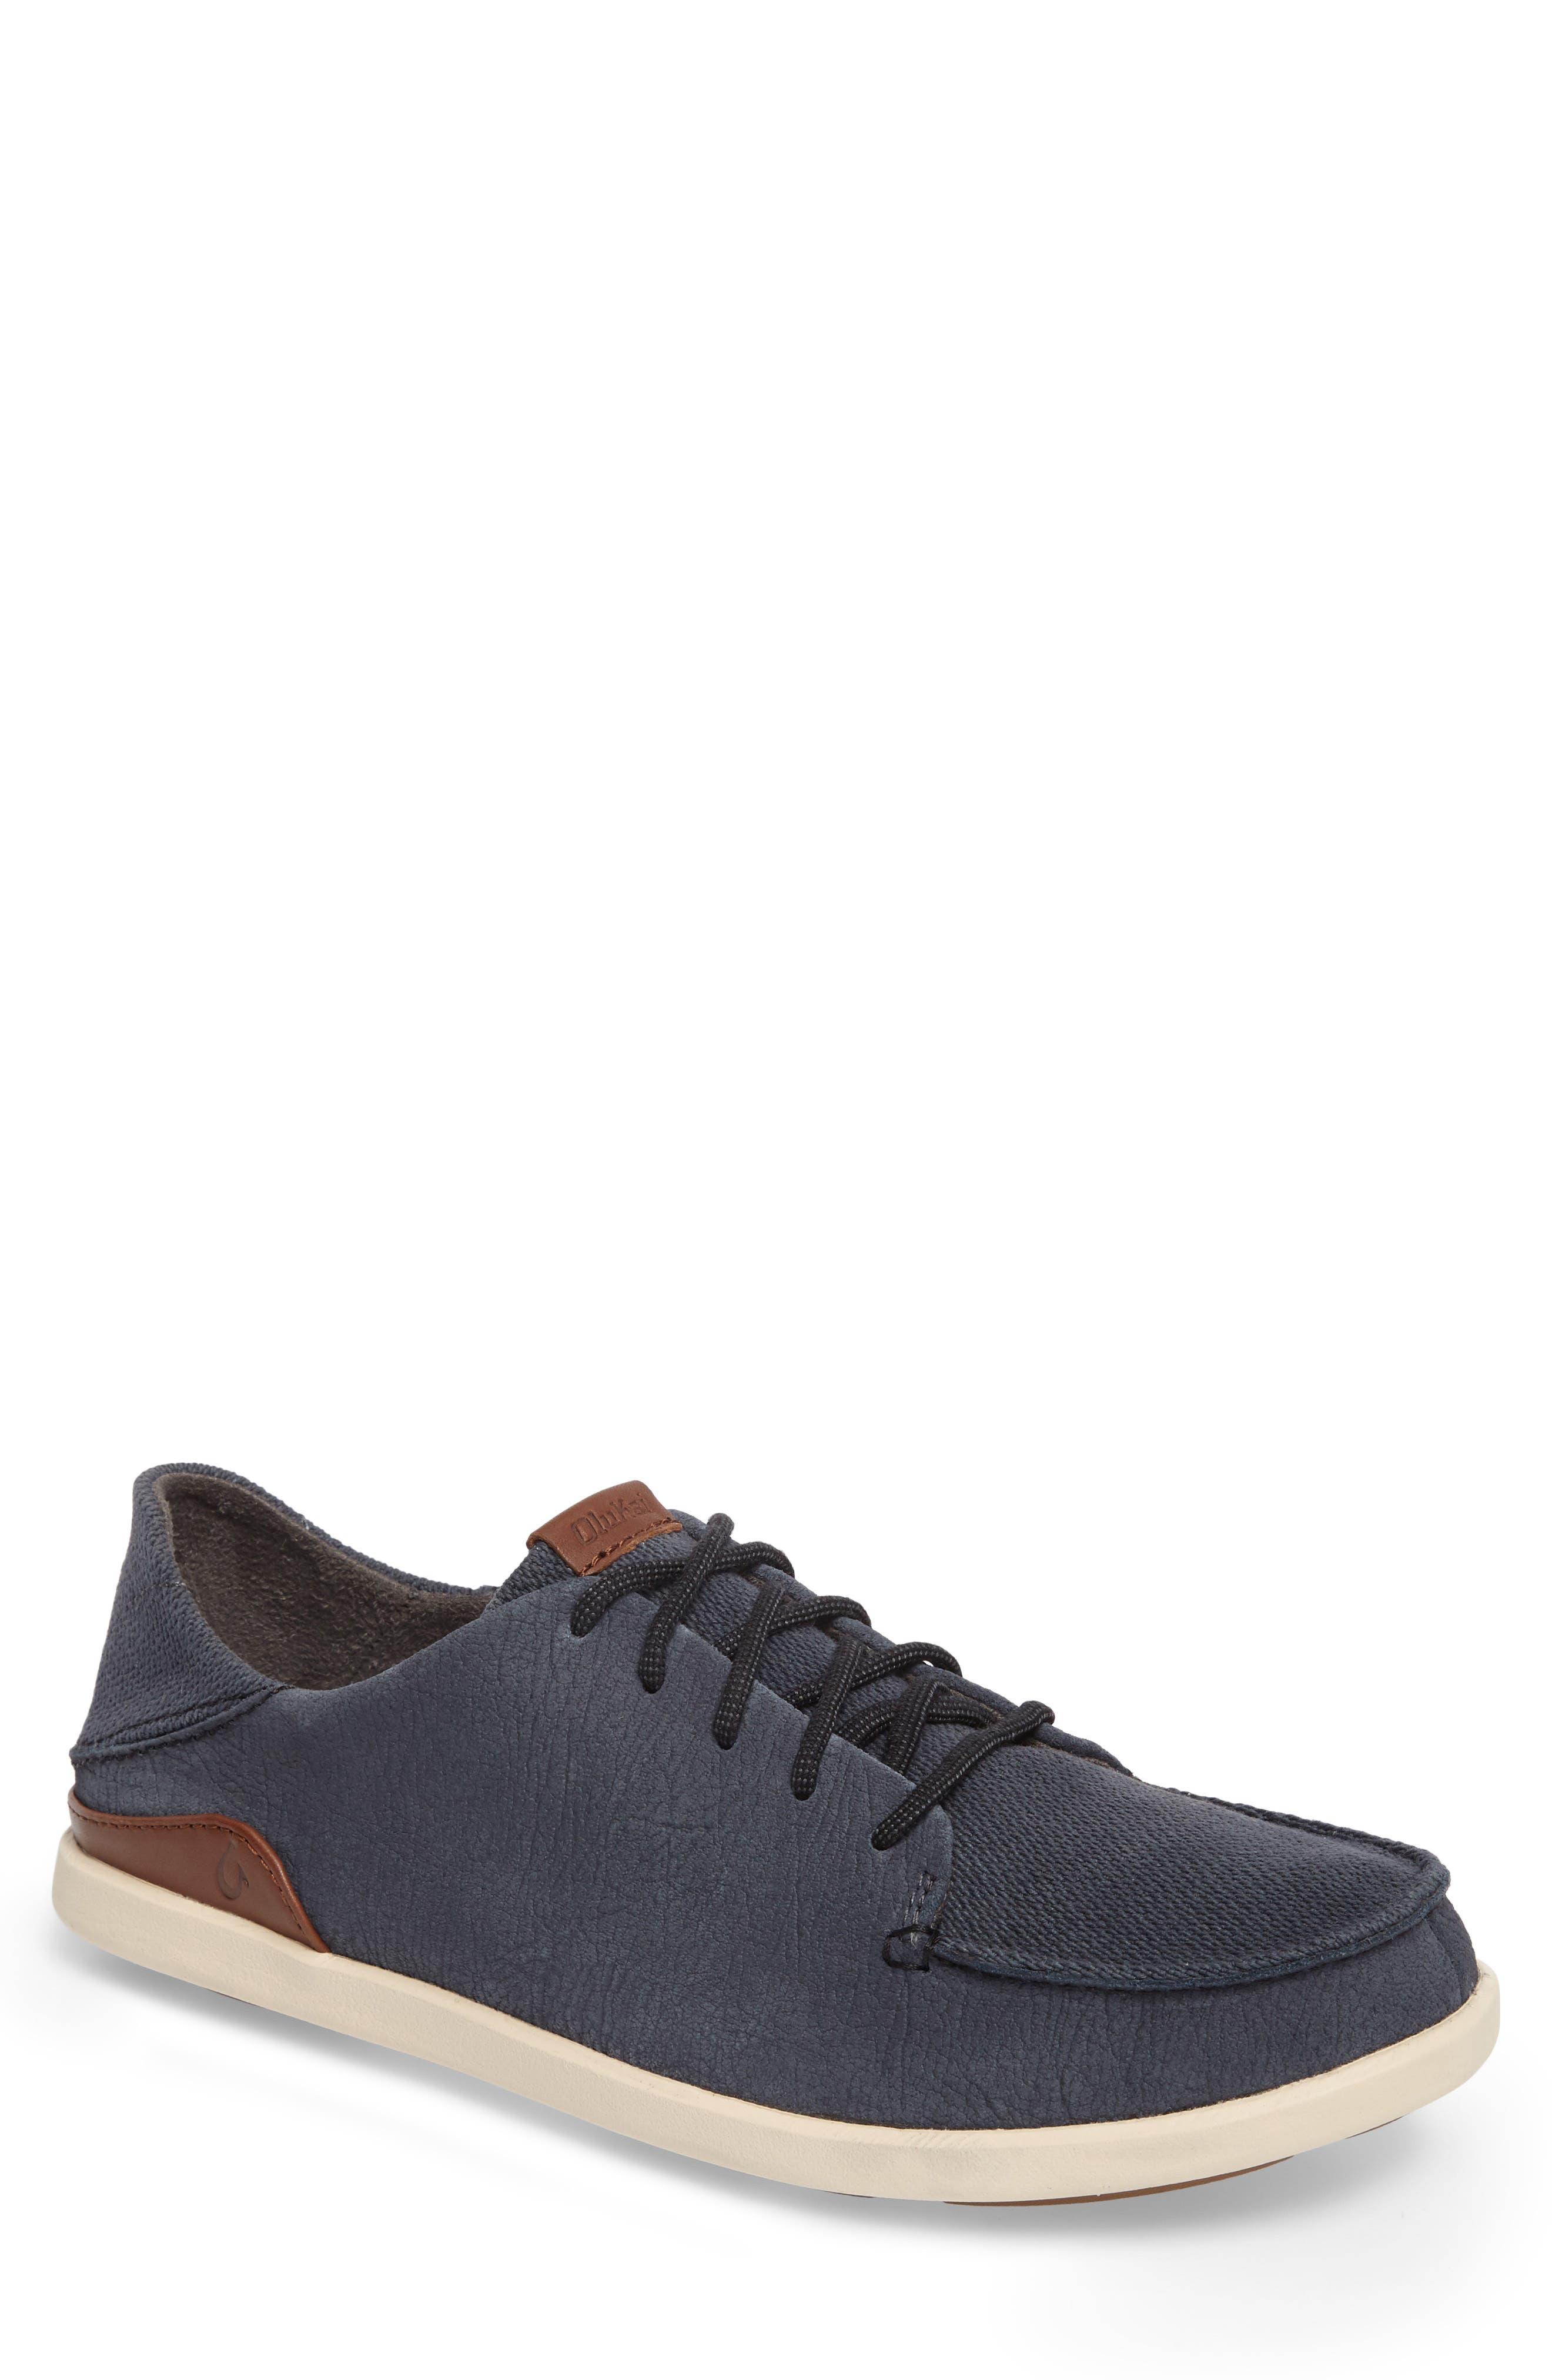 OluKai Manoa Collapsible Sneaker (Men)